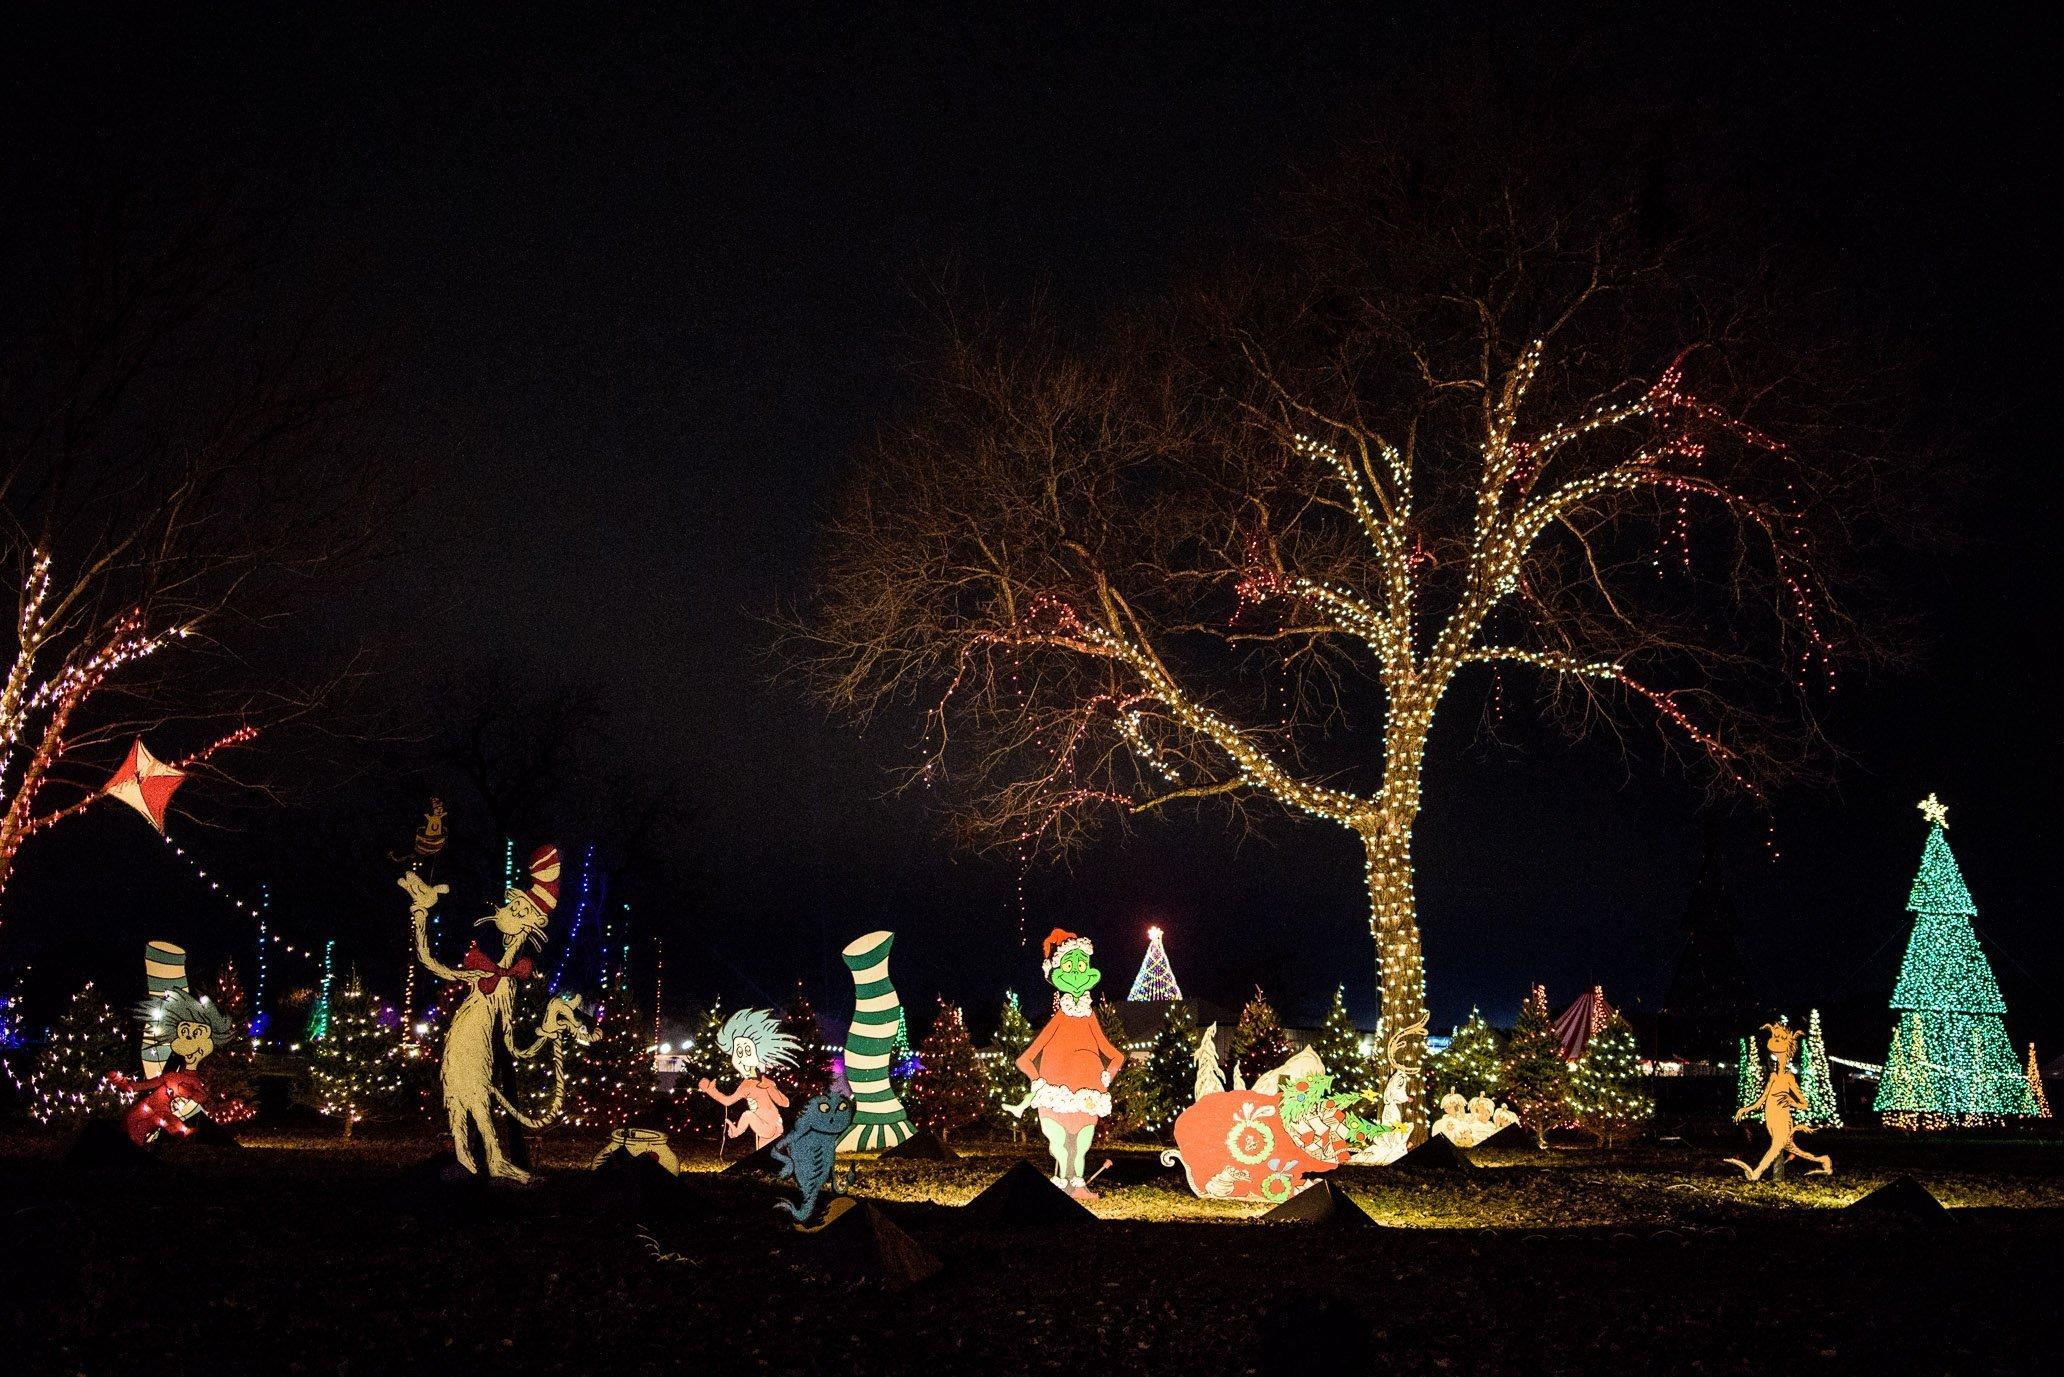 Trail of Lights, Dr, Seuss